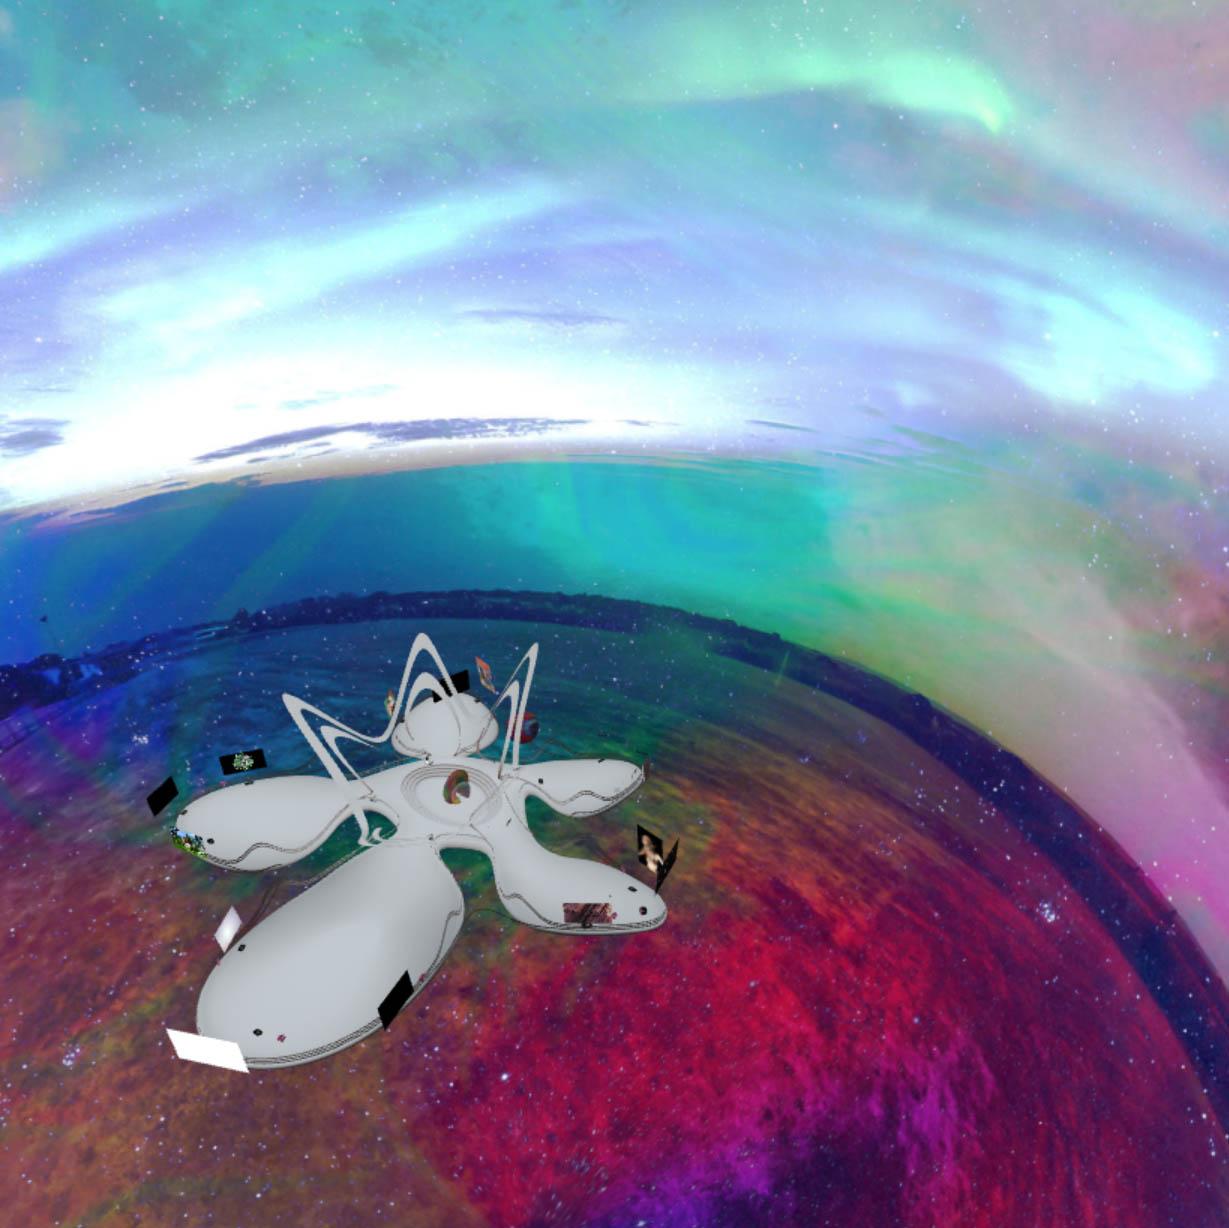 Scene built by Metaxu.Studio -Meta5: The Sublime   VR Exhibit for Agora Digital Art